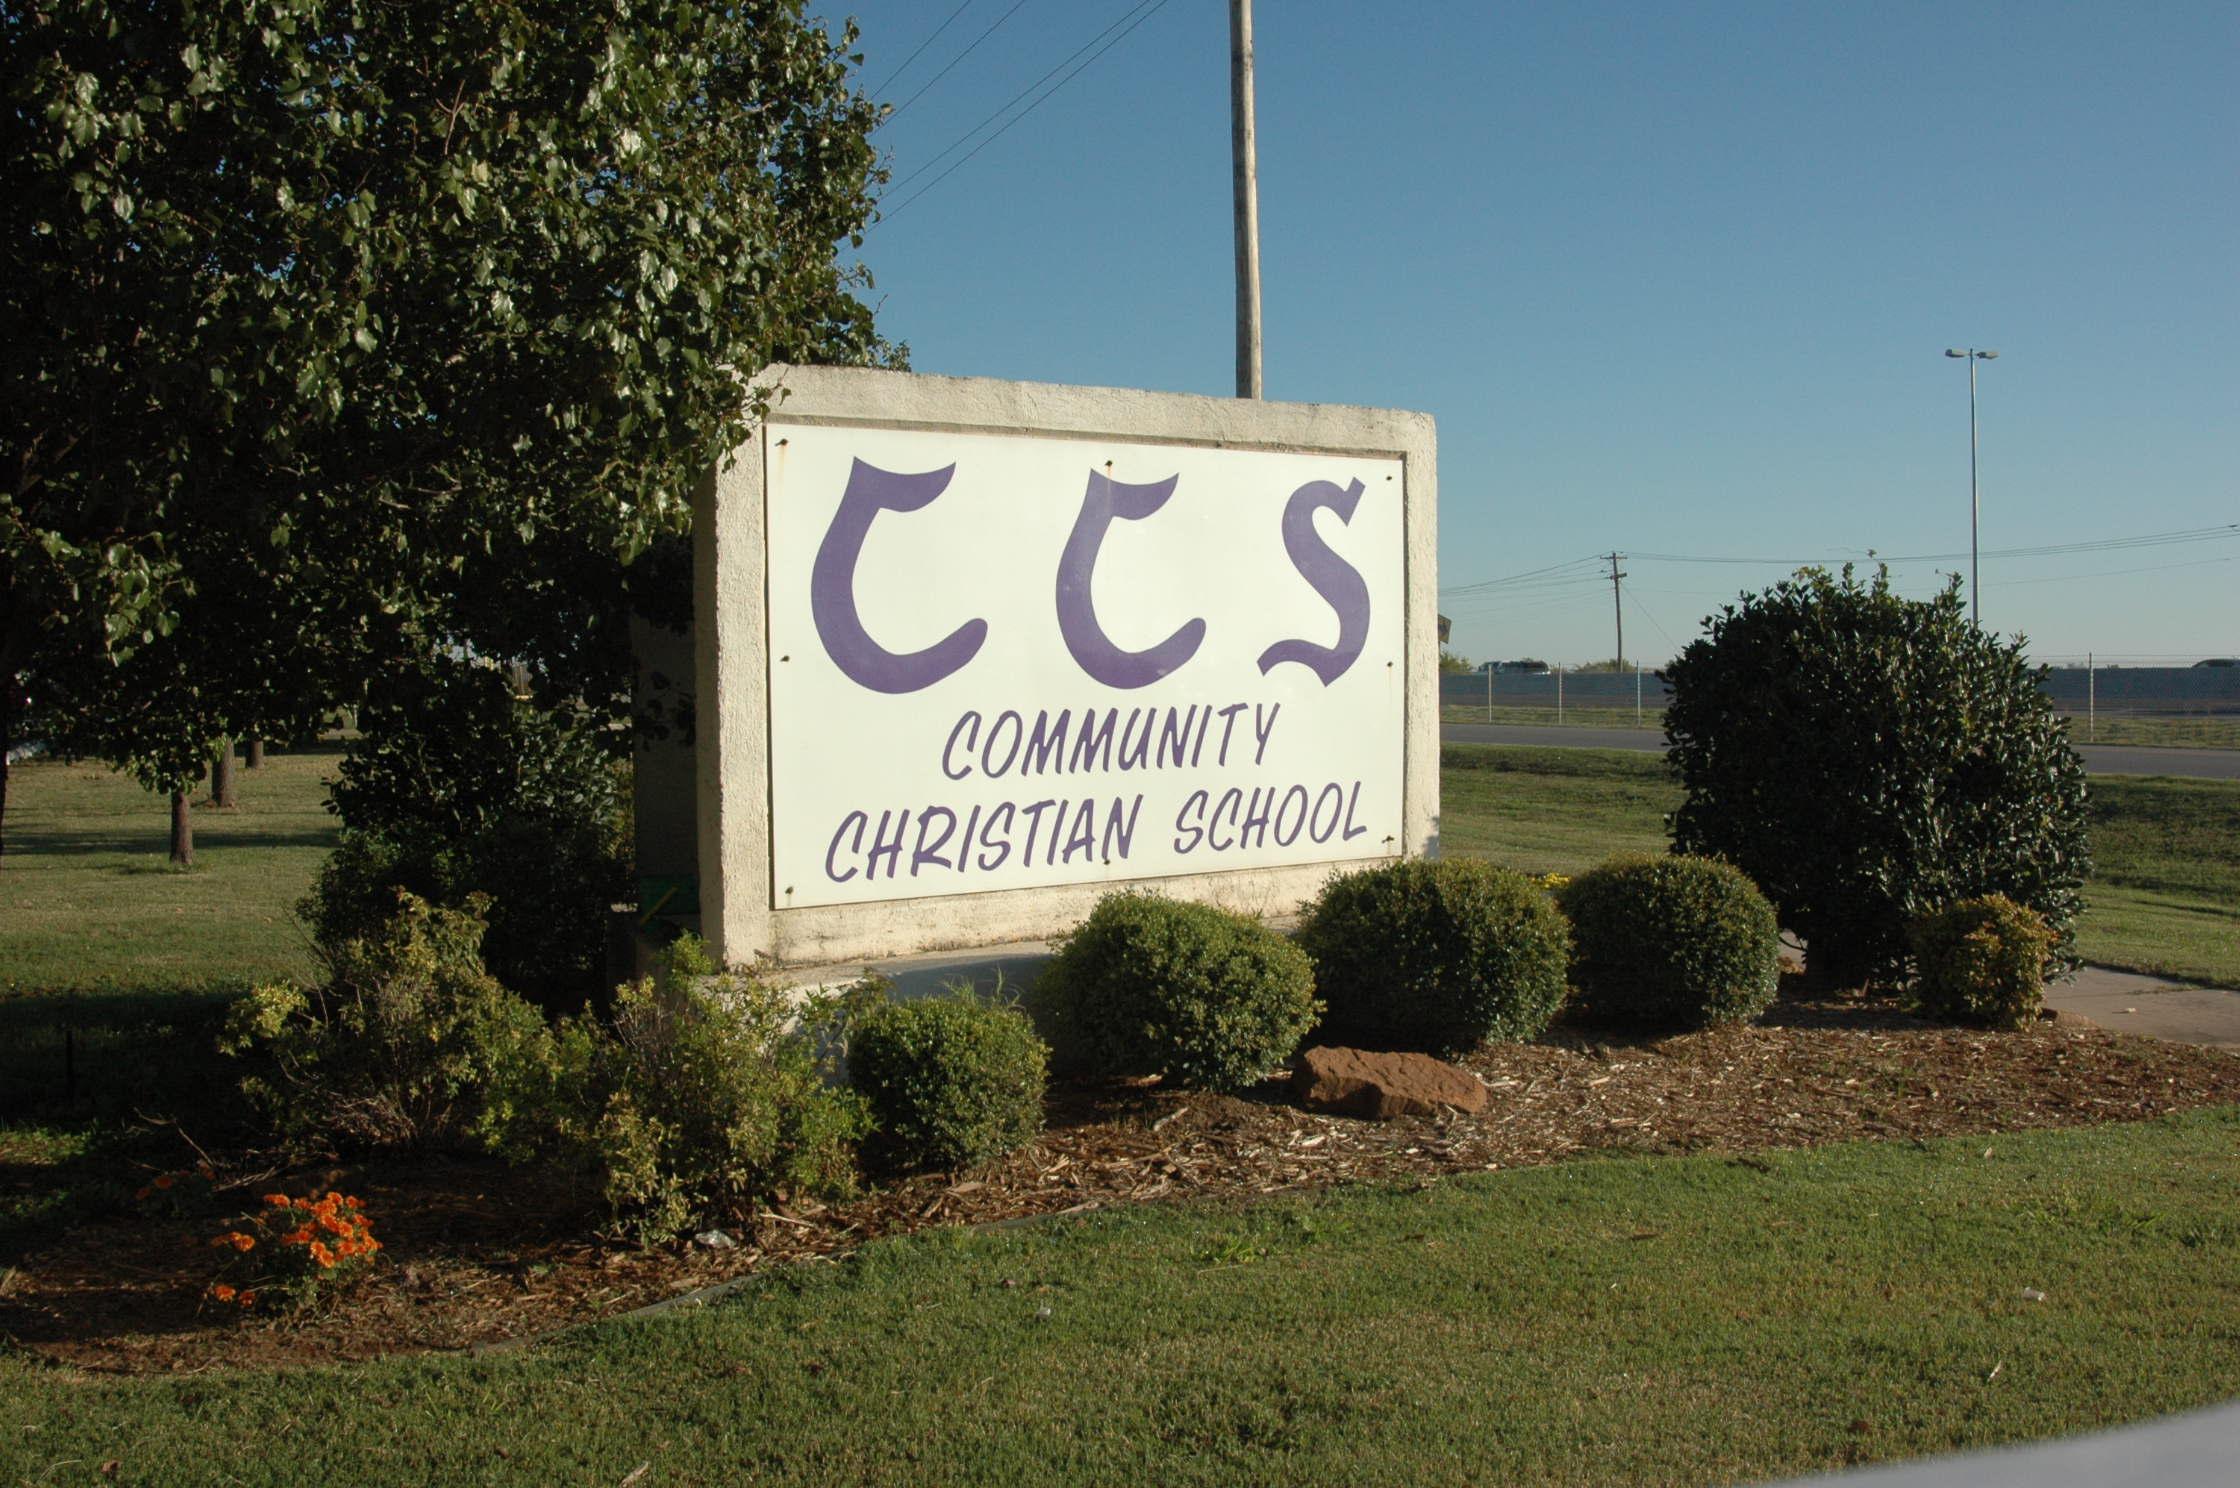 christian community: